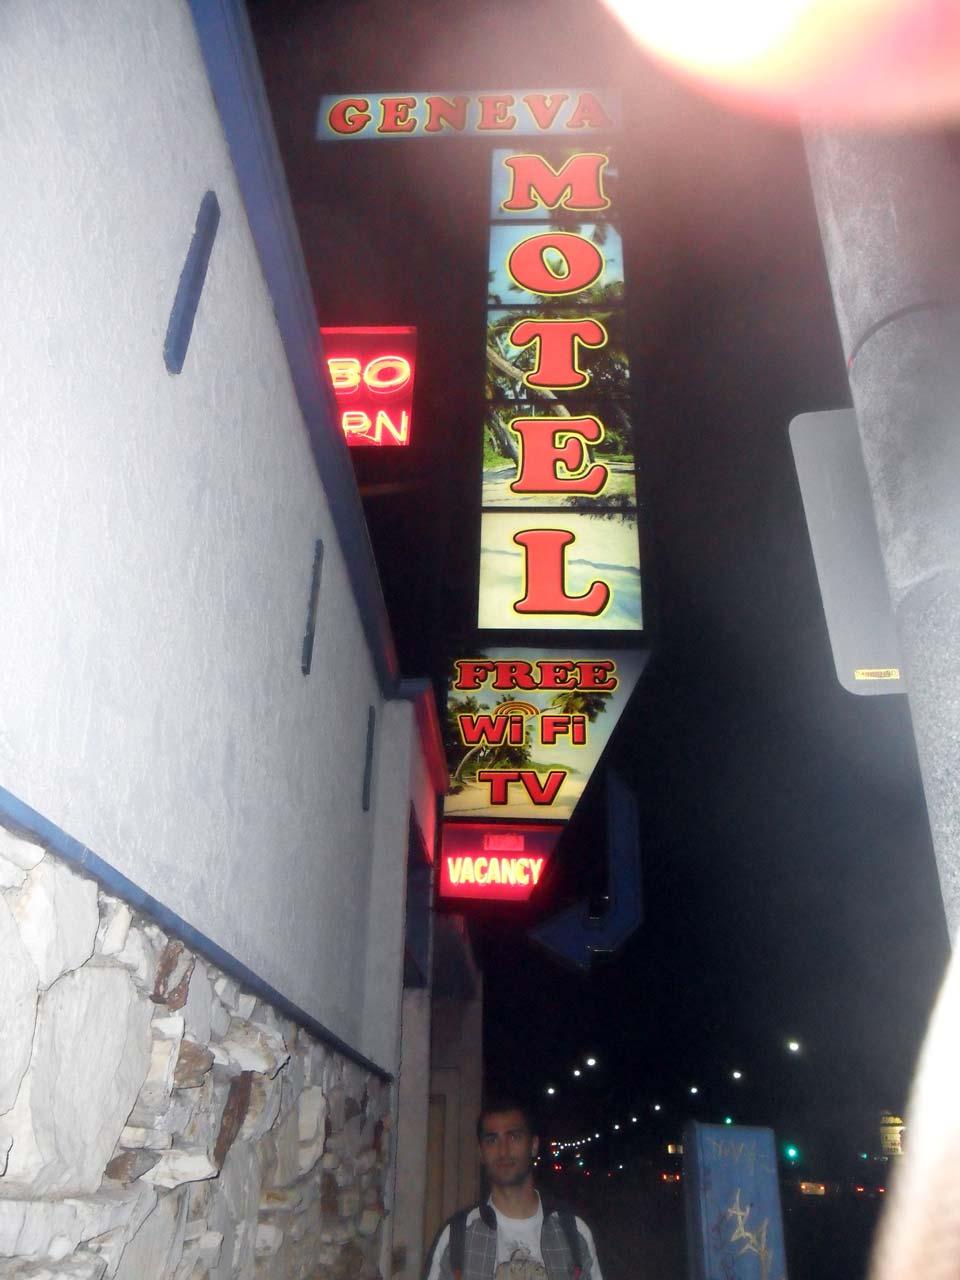 Ve son olarak motelimiz Geneva Motel…